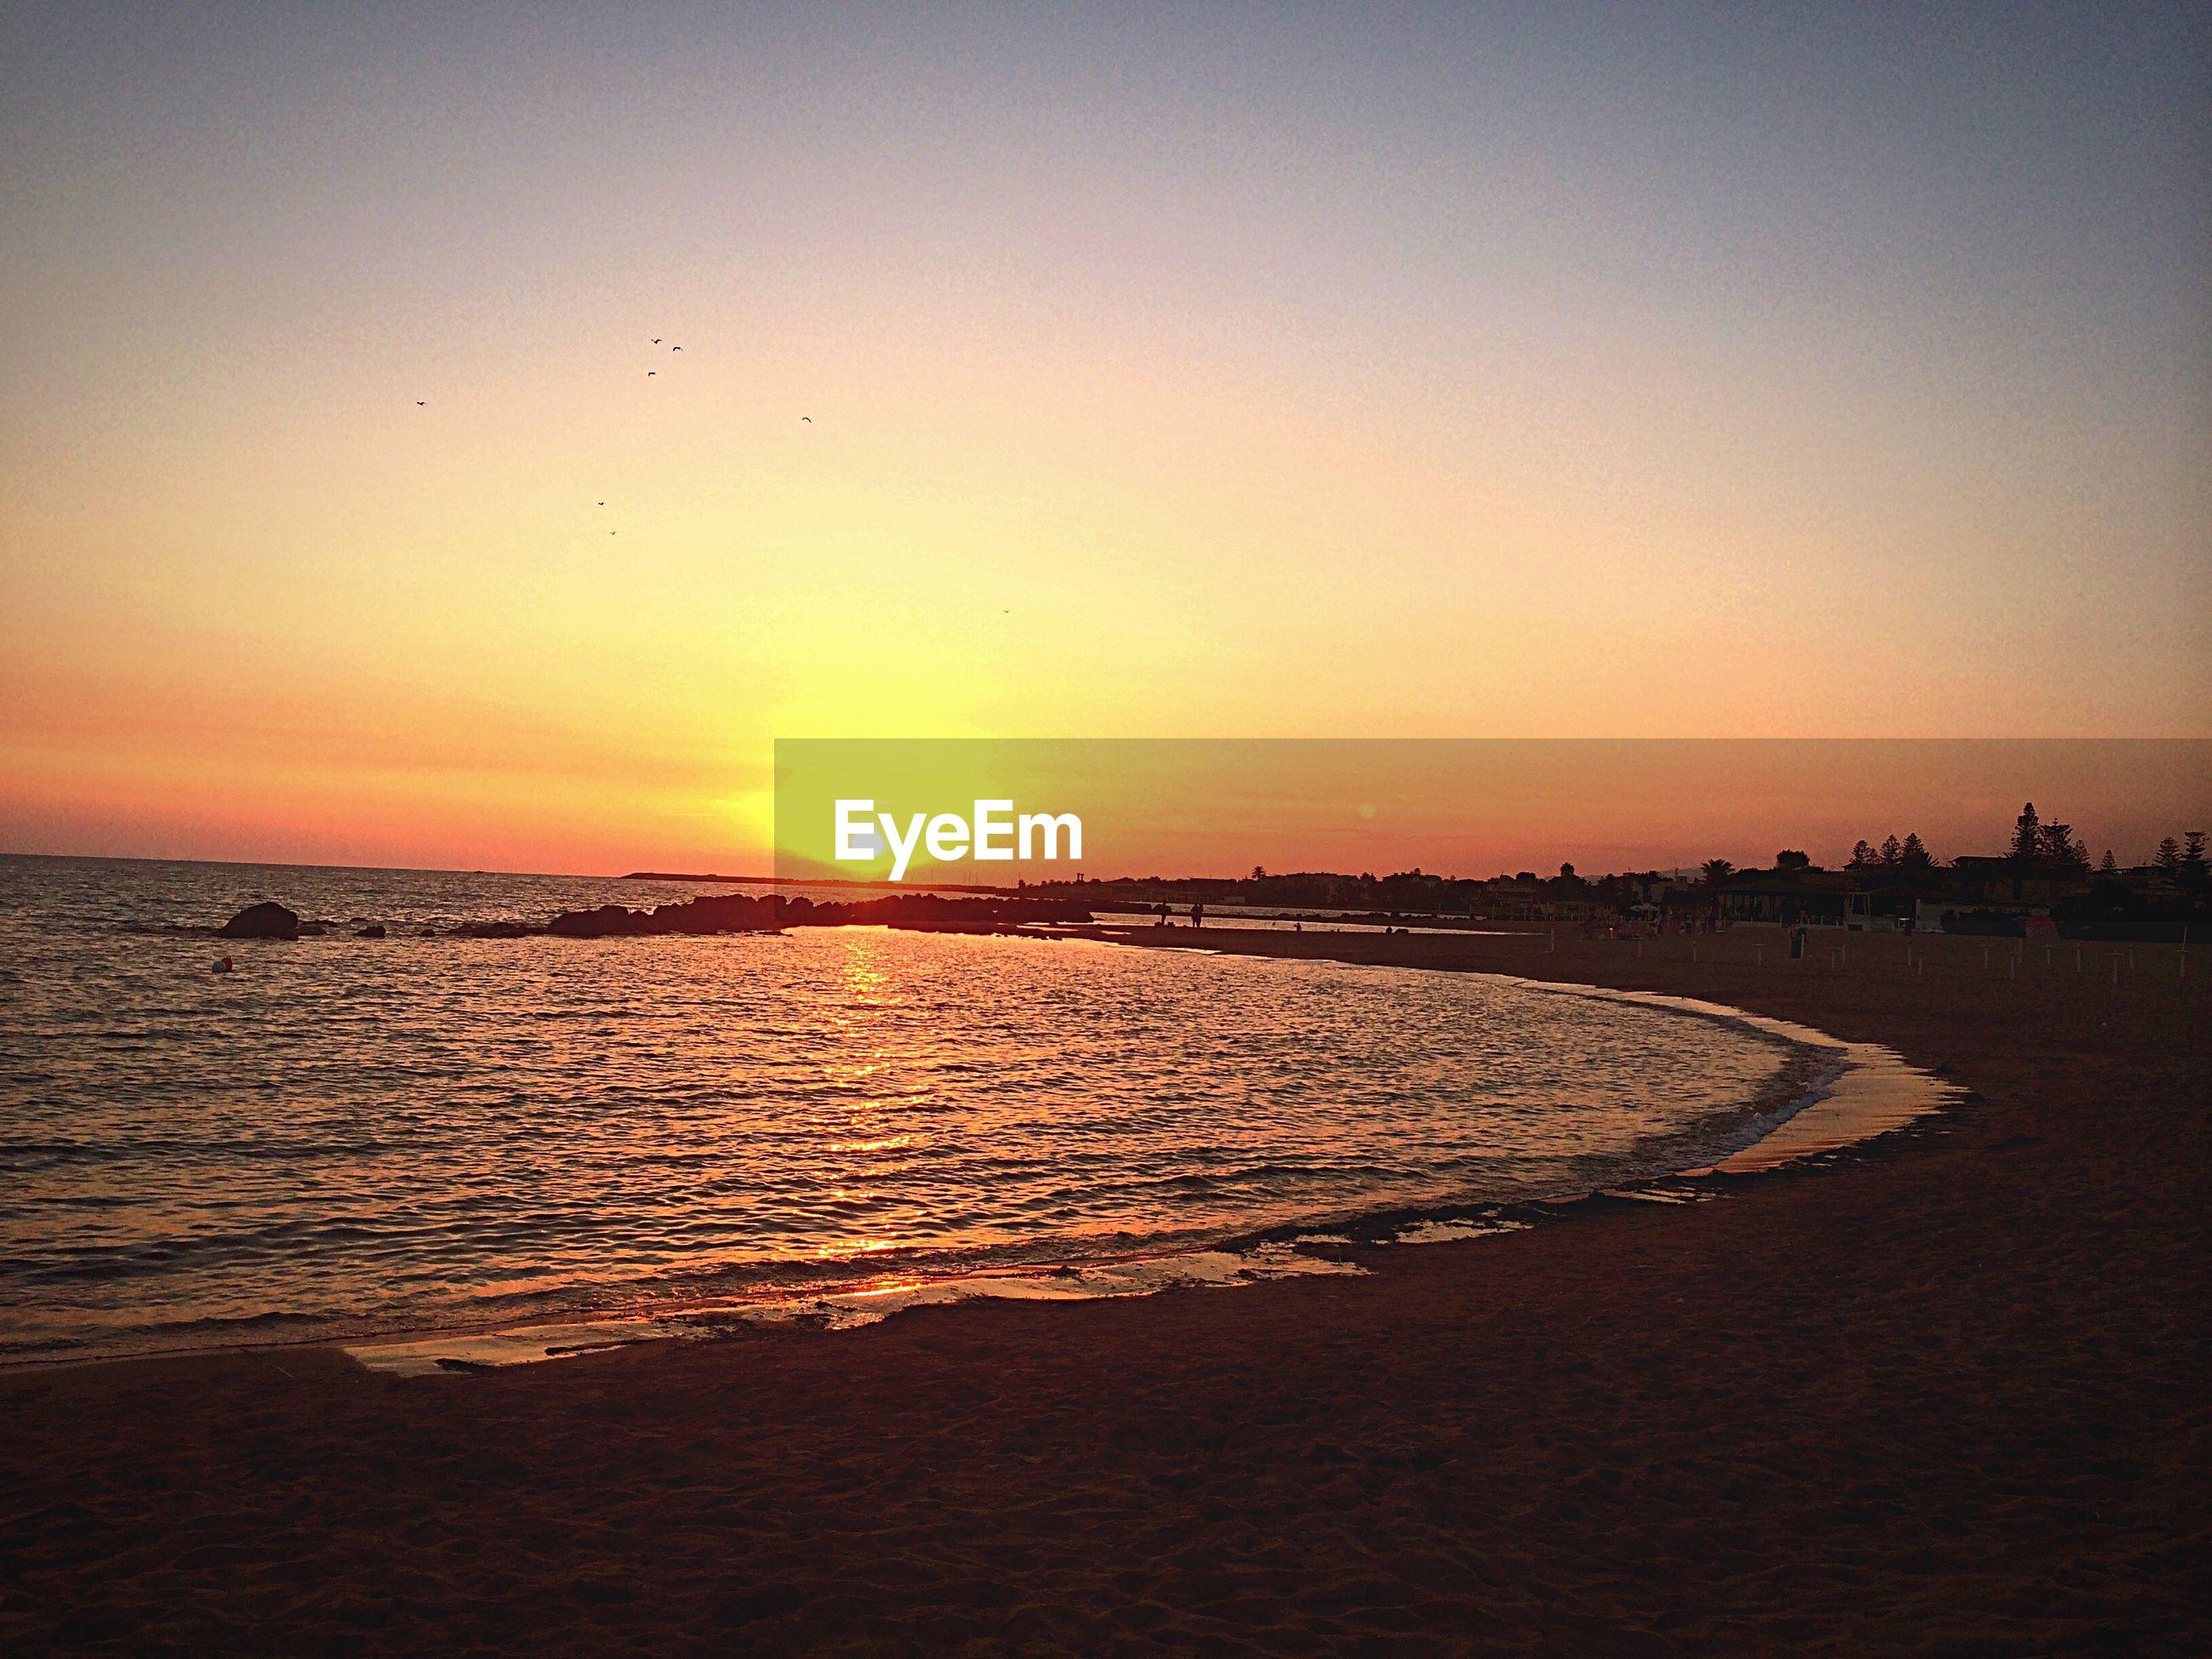 sunset, sea, water, beach, horizon over water, scenics, sun, orange color, tranquil scene, shore, beauty in nature, tranquility, silhouette, bird, idyllic, nature, sand, sky, incidental people, sunlight